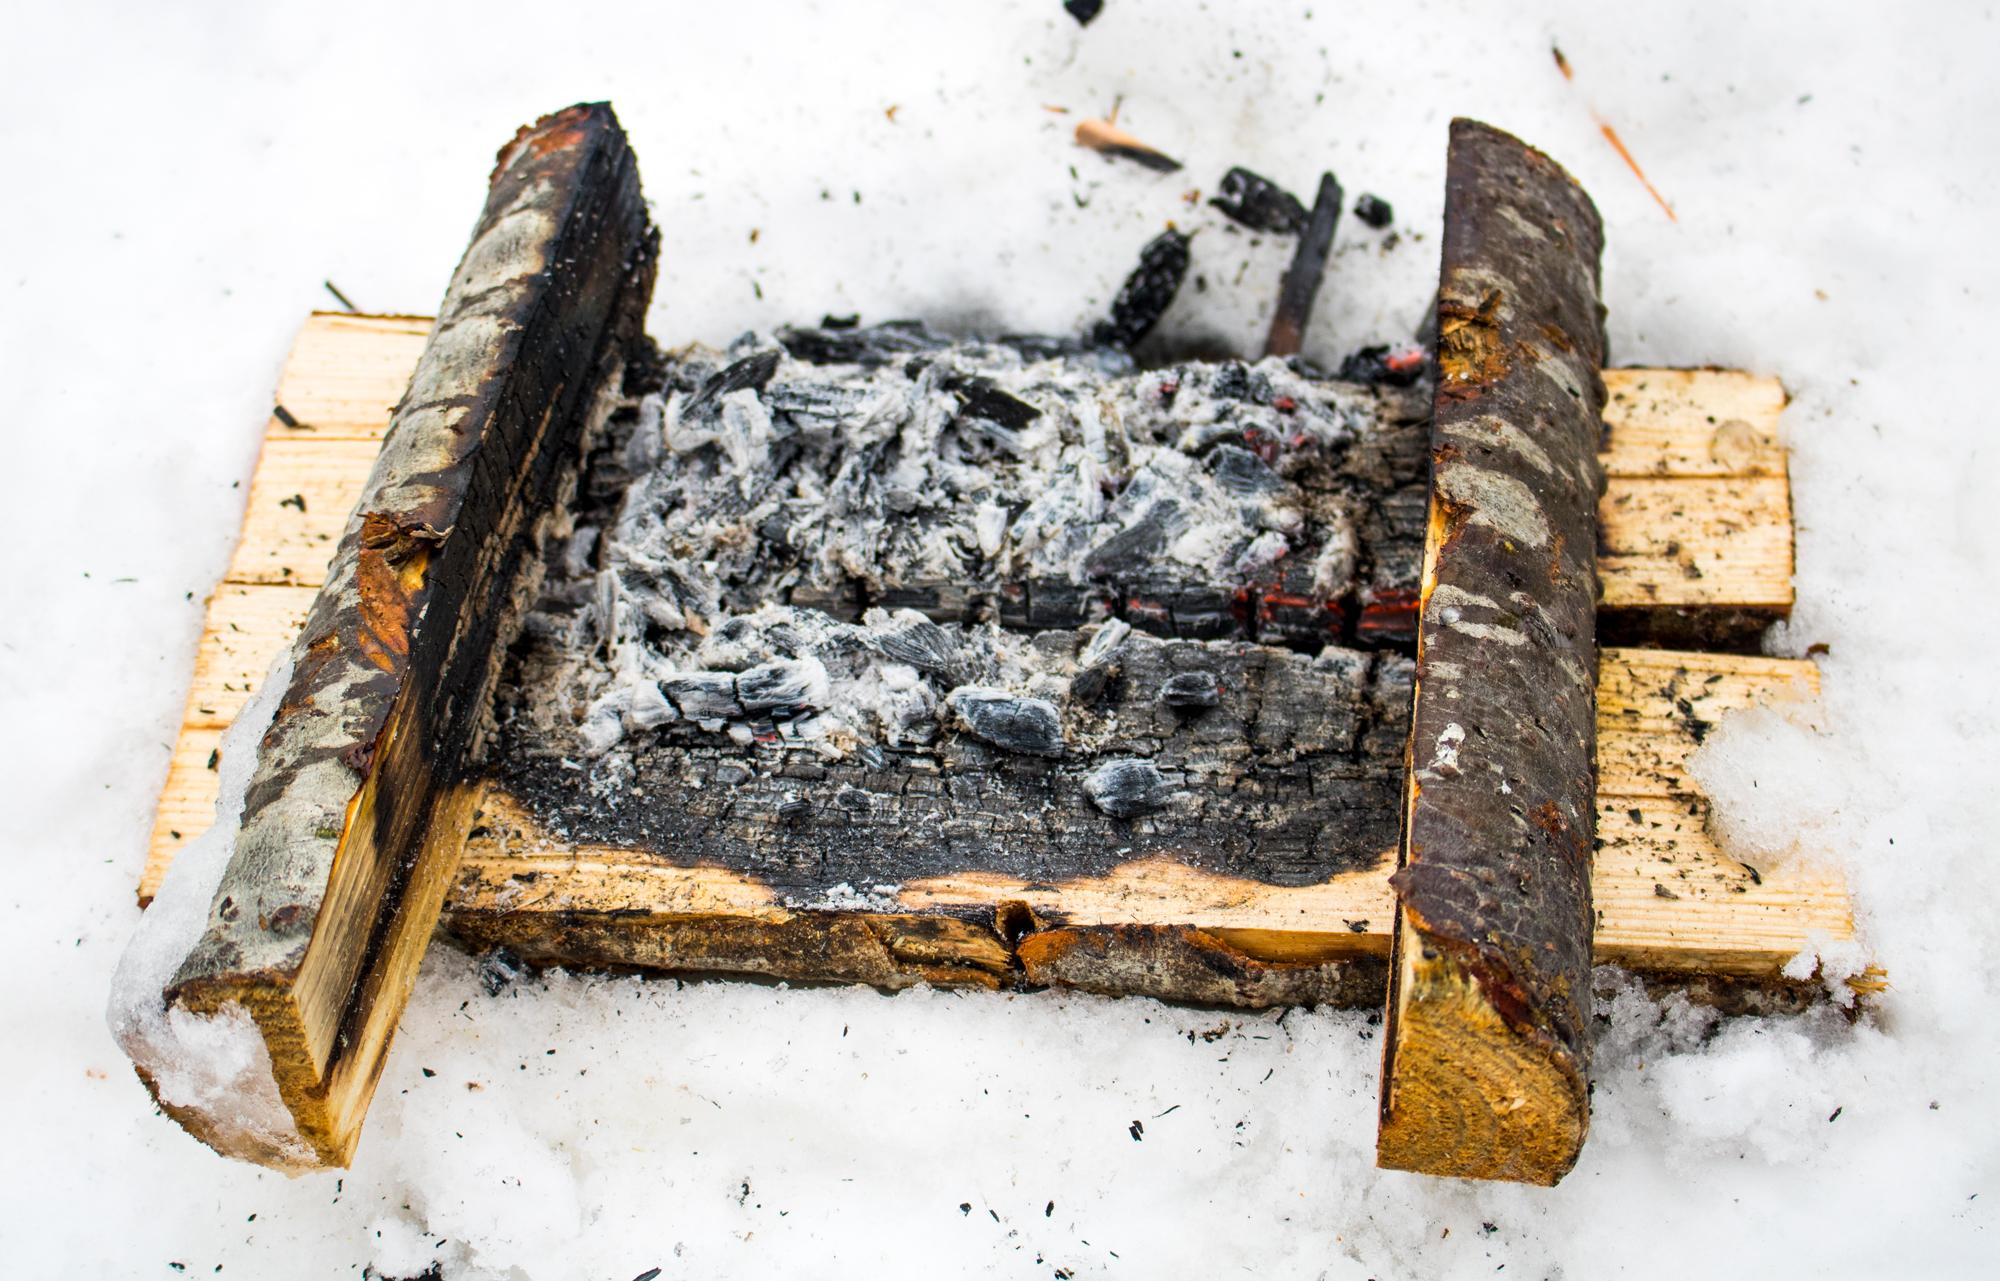 Grill9-Leftover-Fire-Base.jpg